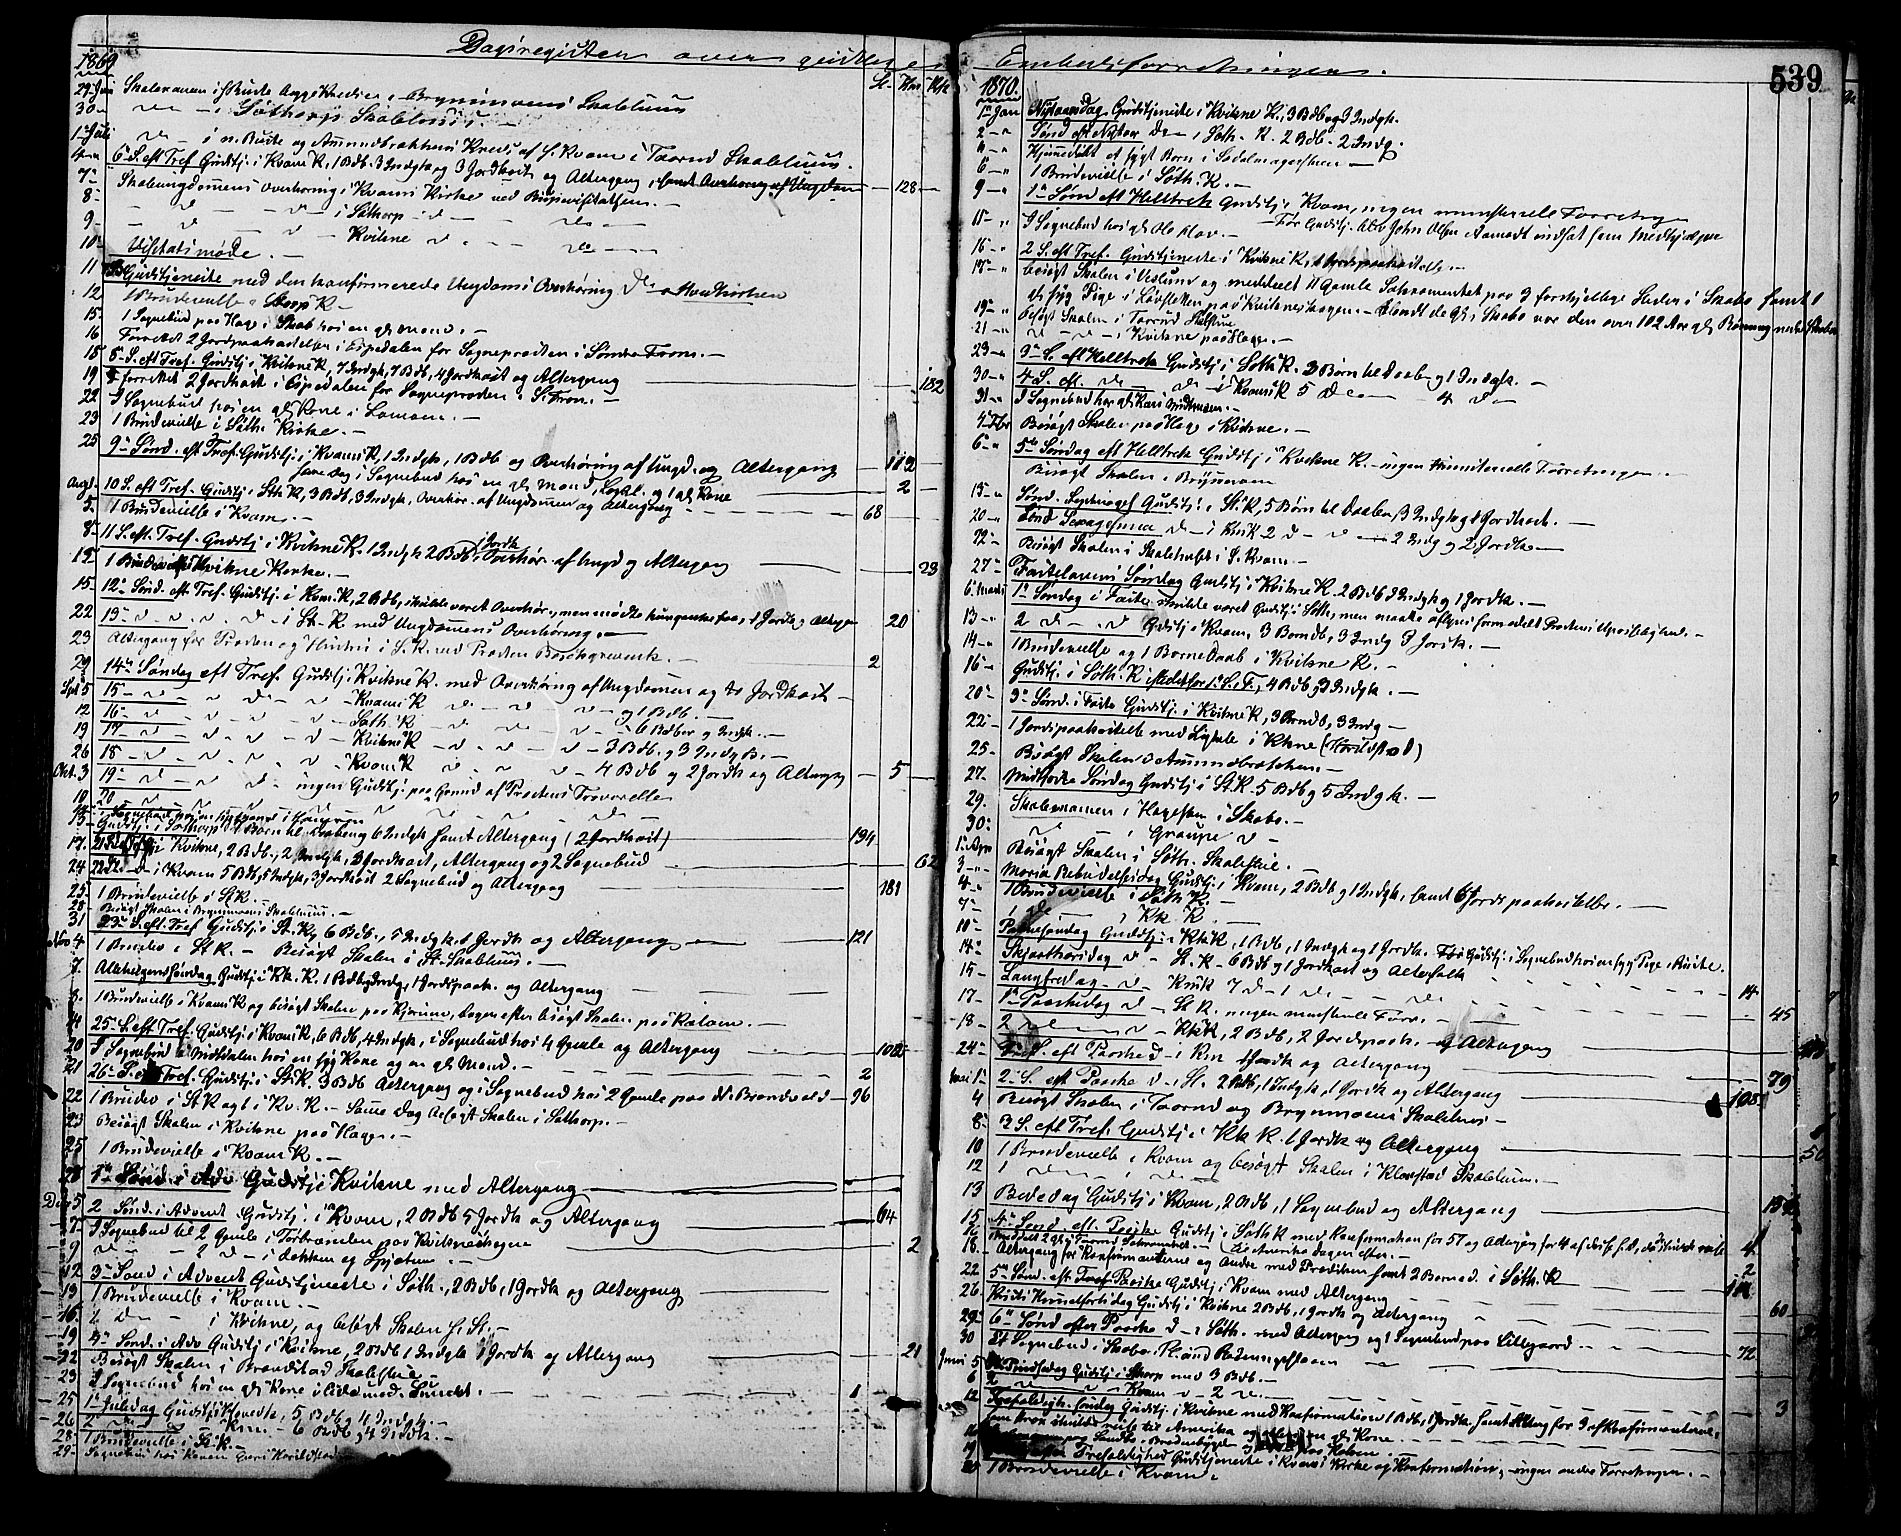 SAH, Nord-Fron prestekontor, Ministerialbok nr. 2, 1865-1883, s. 539